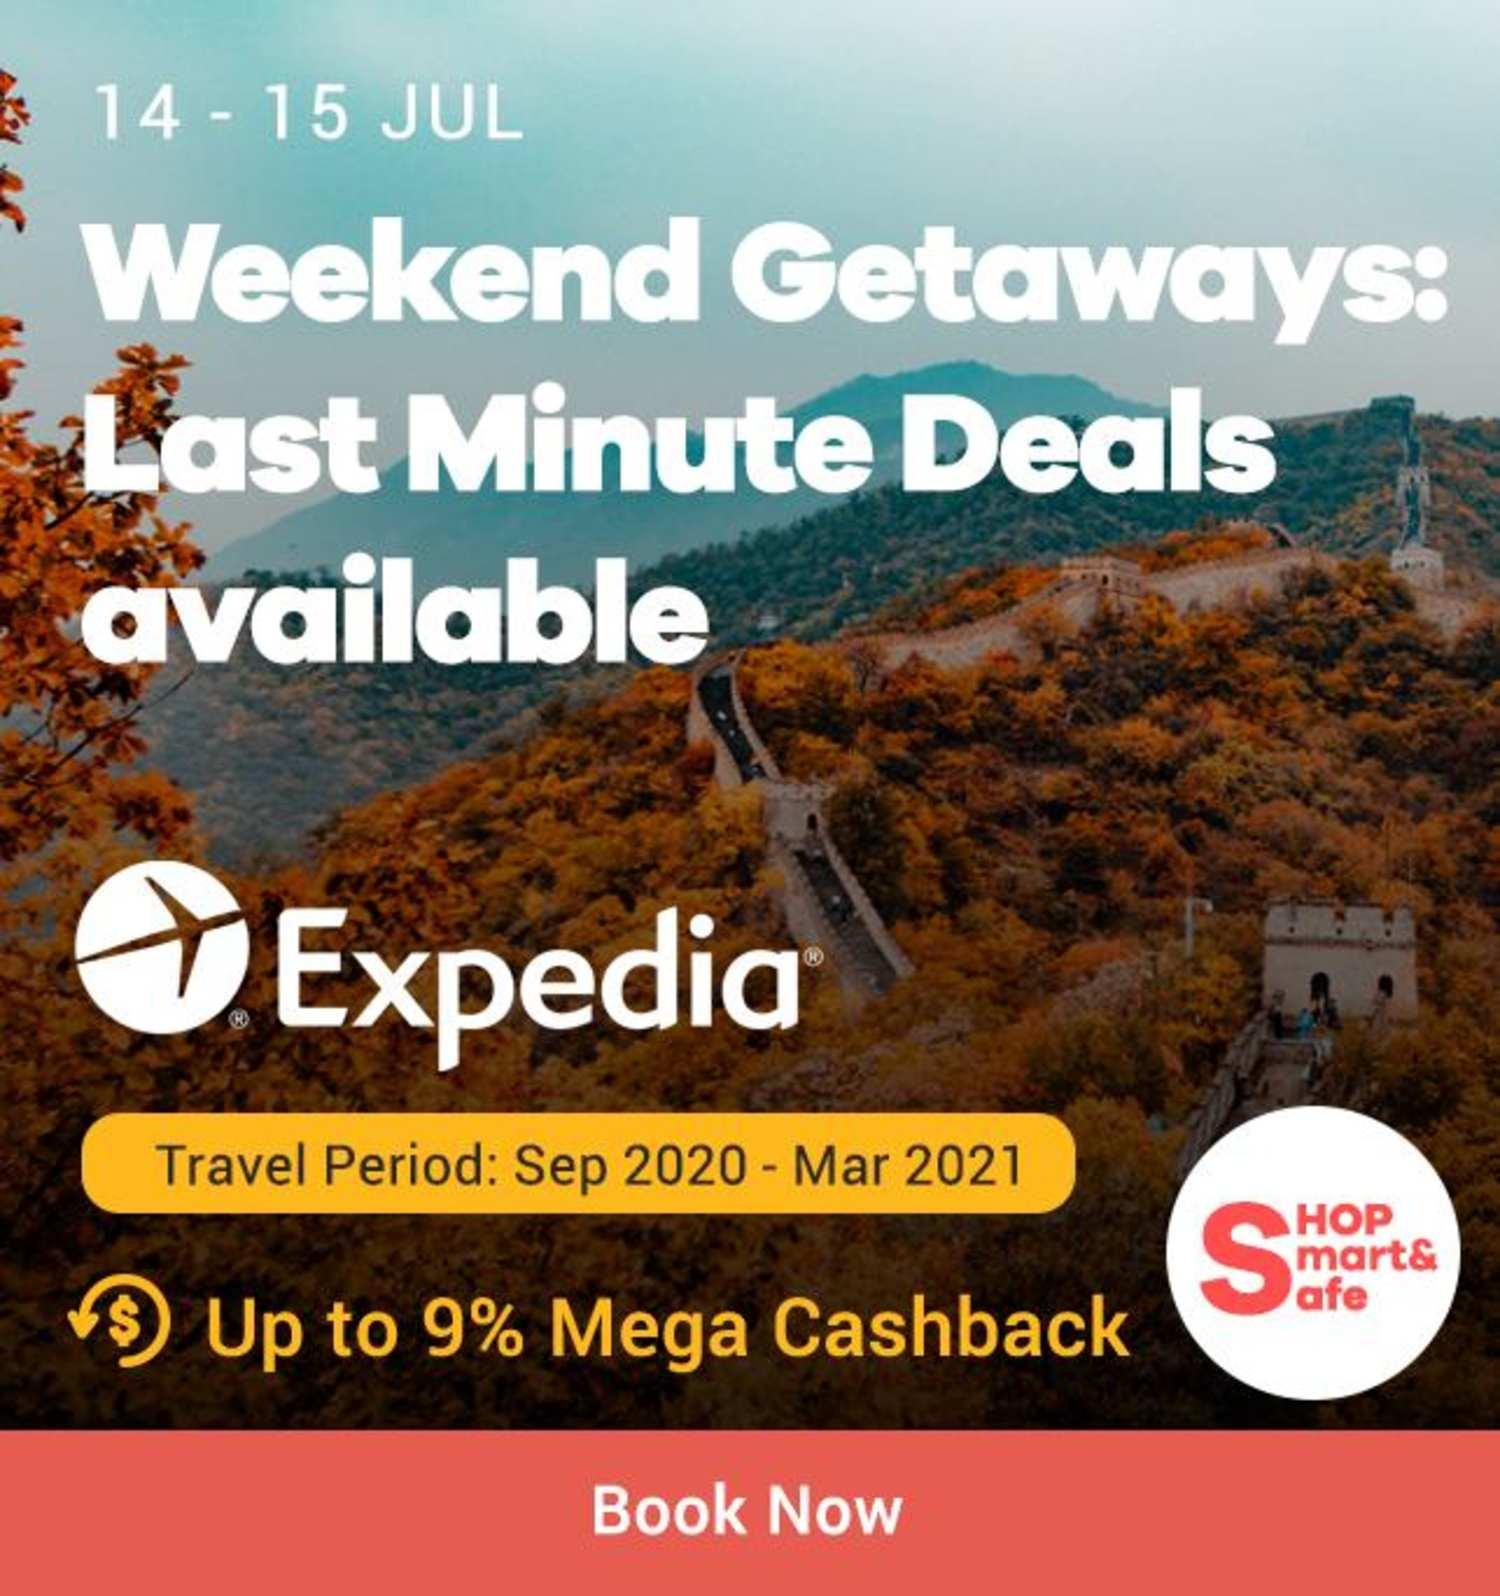 Expedia: Weekend Getaways Last Minute Deals Available